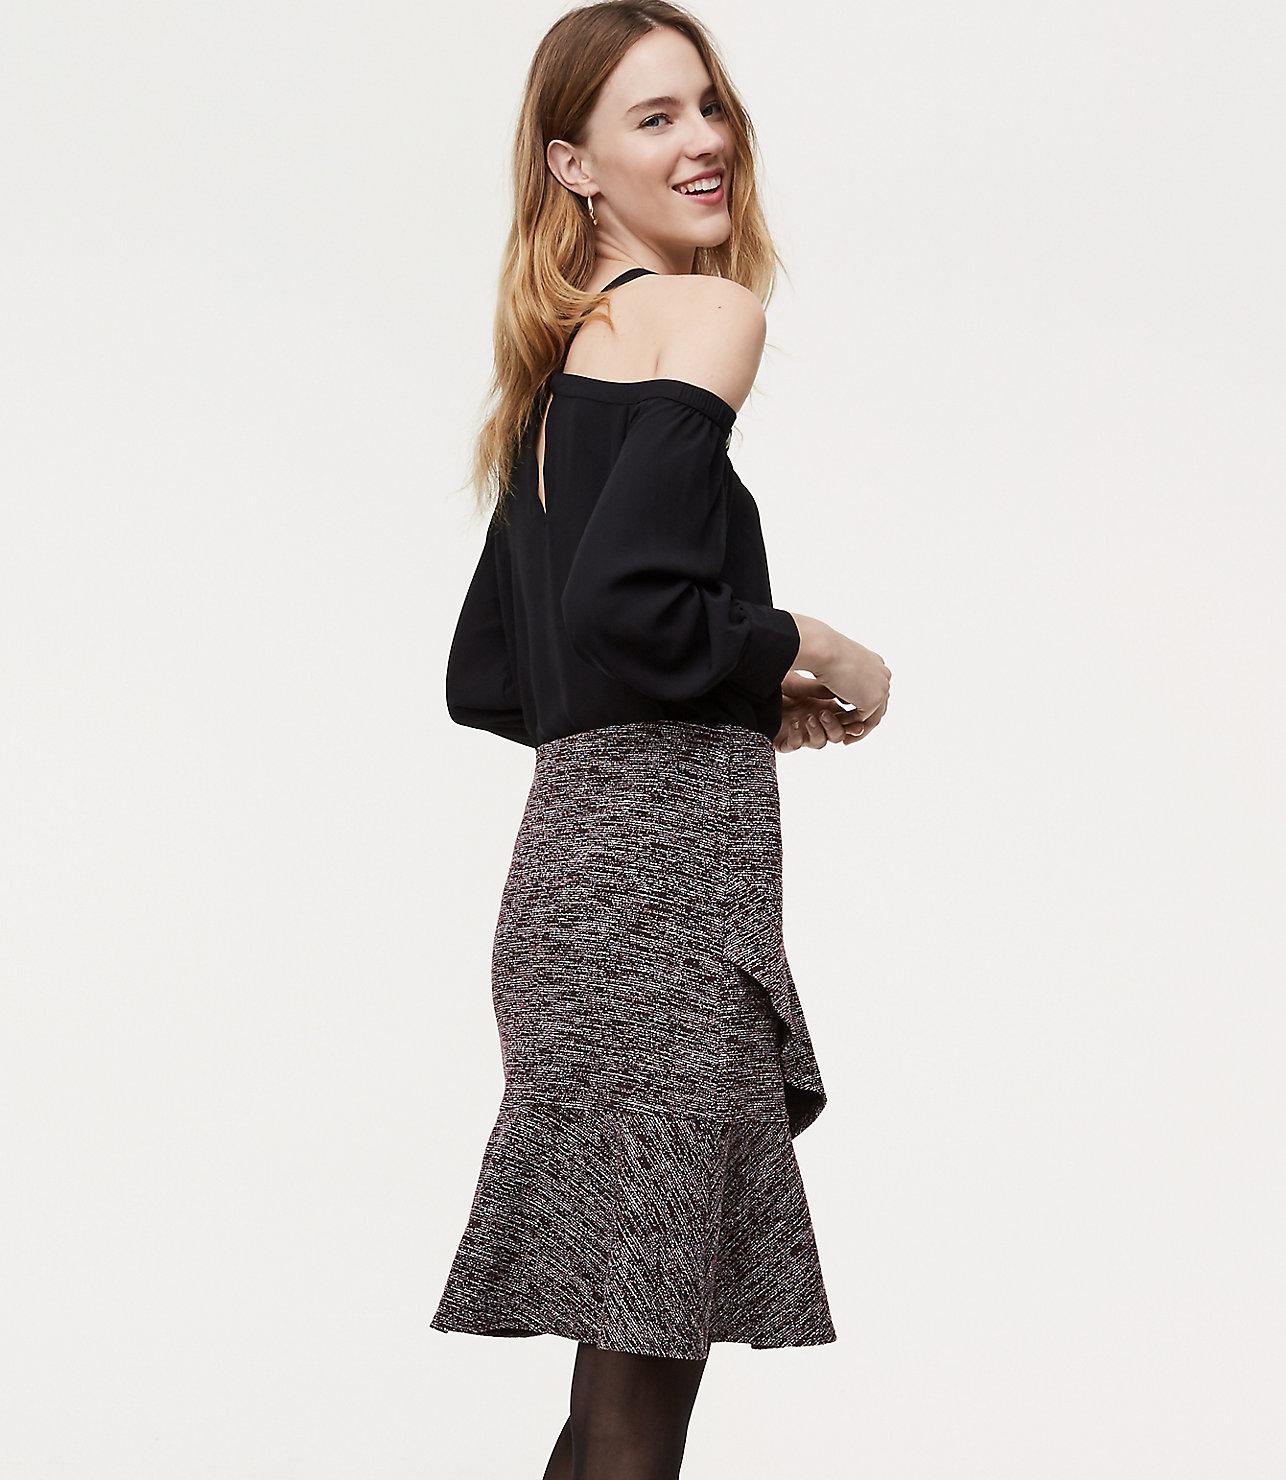 ba6a747b353 LOFT Tweed Ruffle Wrap Skirt in Black - Lyst